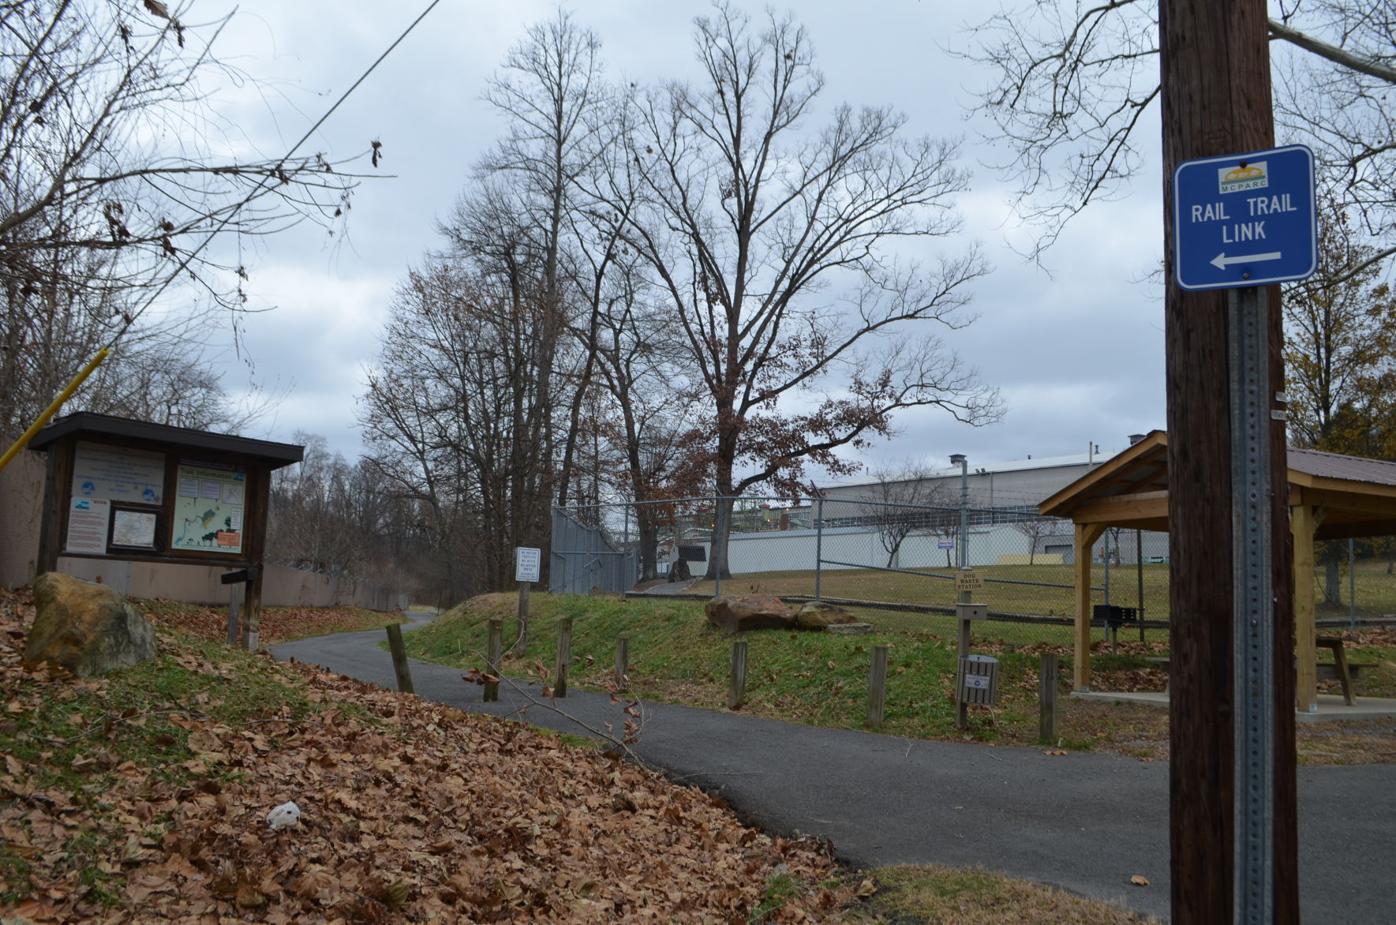 Marion Co. Rail Trail entrance